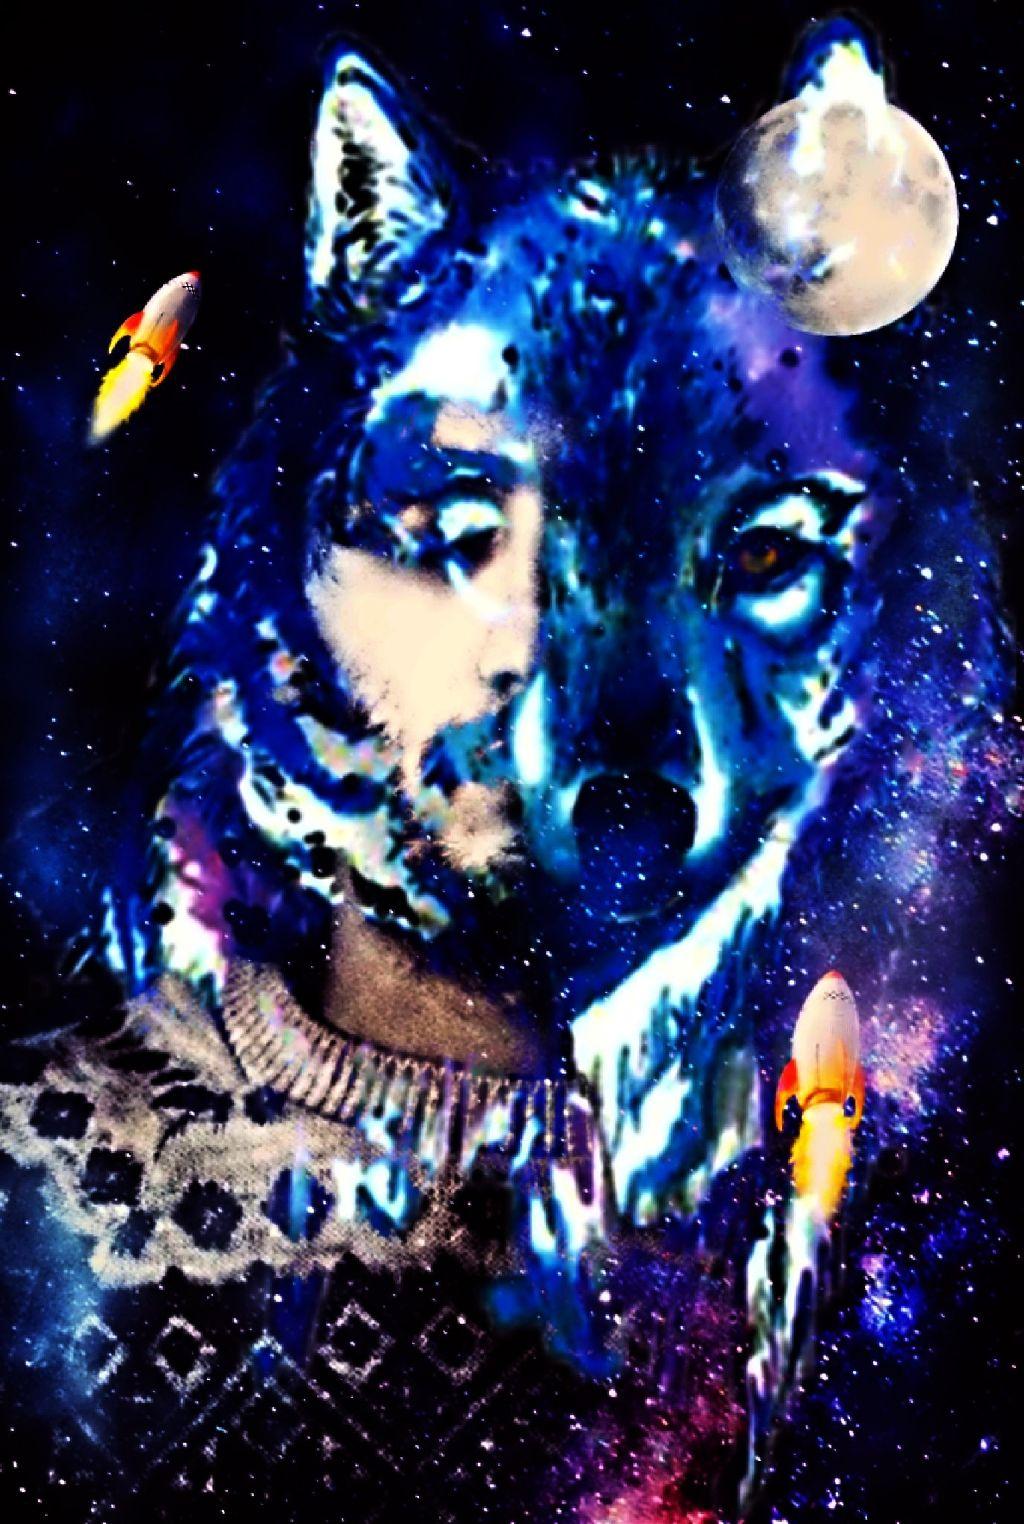 #freetoedit #doubleexposure #doubleexposures @andreiaserra12 #wolf #moon #nigth #blue #sky #heavens #heavensent #human #humans #fallow_me #trumblr #vote #like